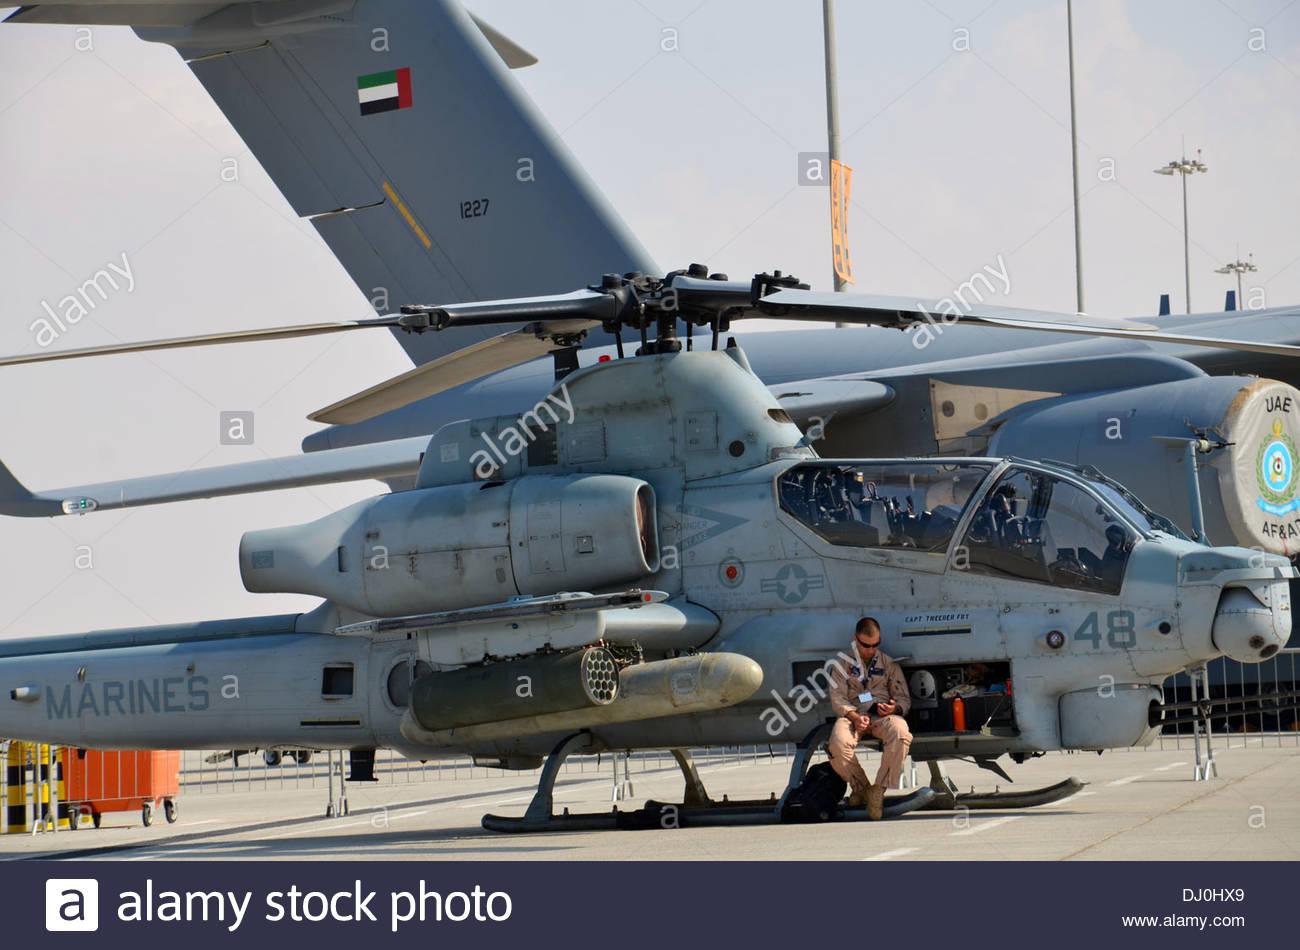 U.S. Marine Corps Capt. James Kerrigan takes a break from the desert sun at the biennial Dubai Airshow at Dubai World Central ai - Stock Image